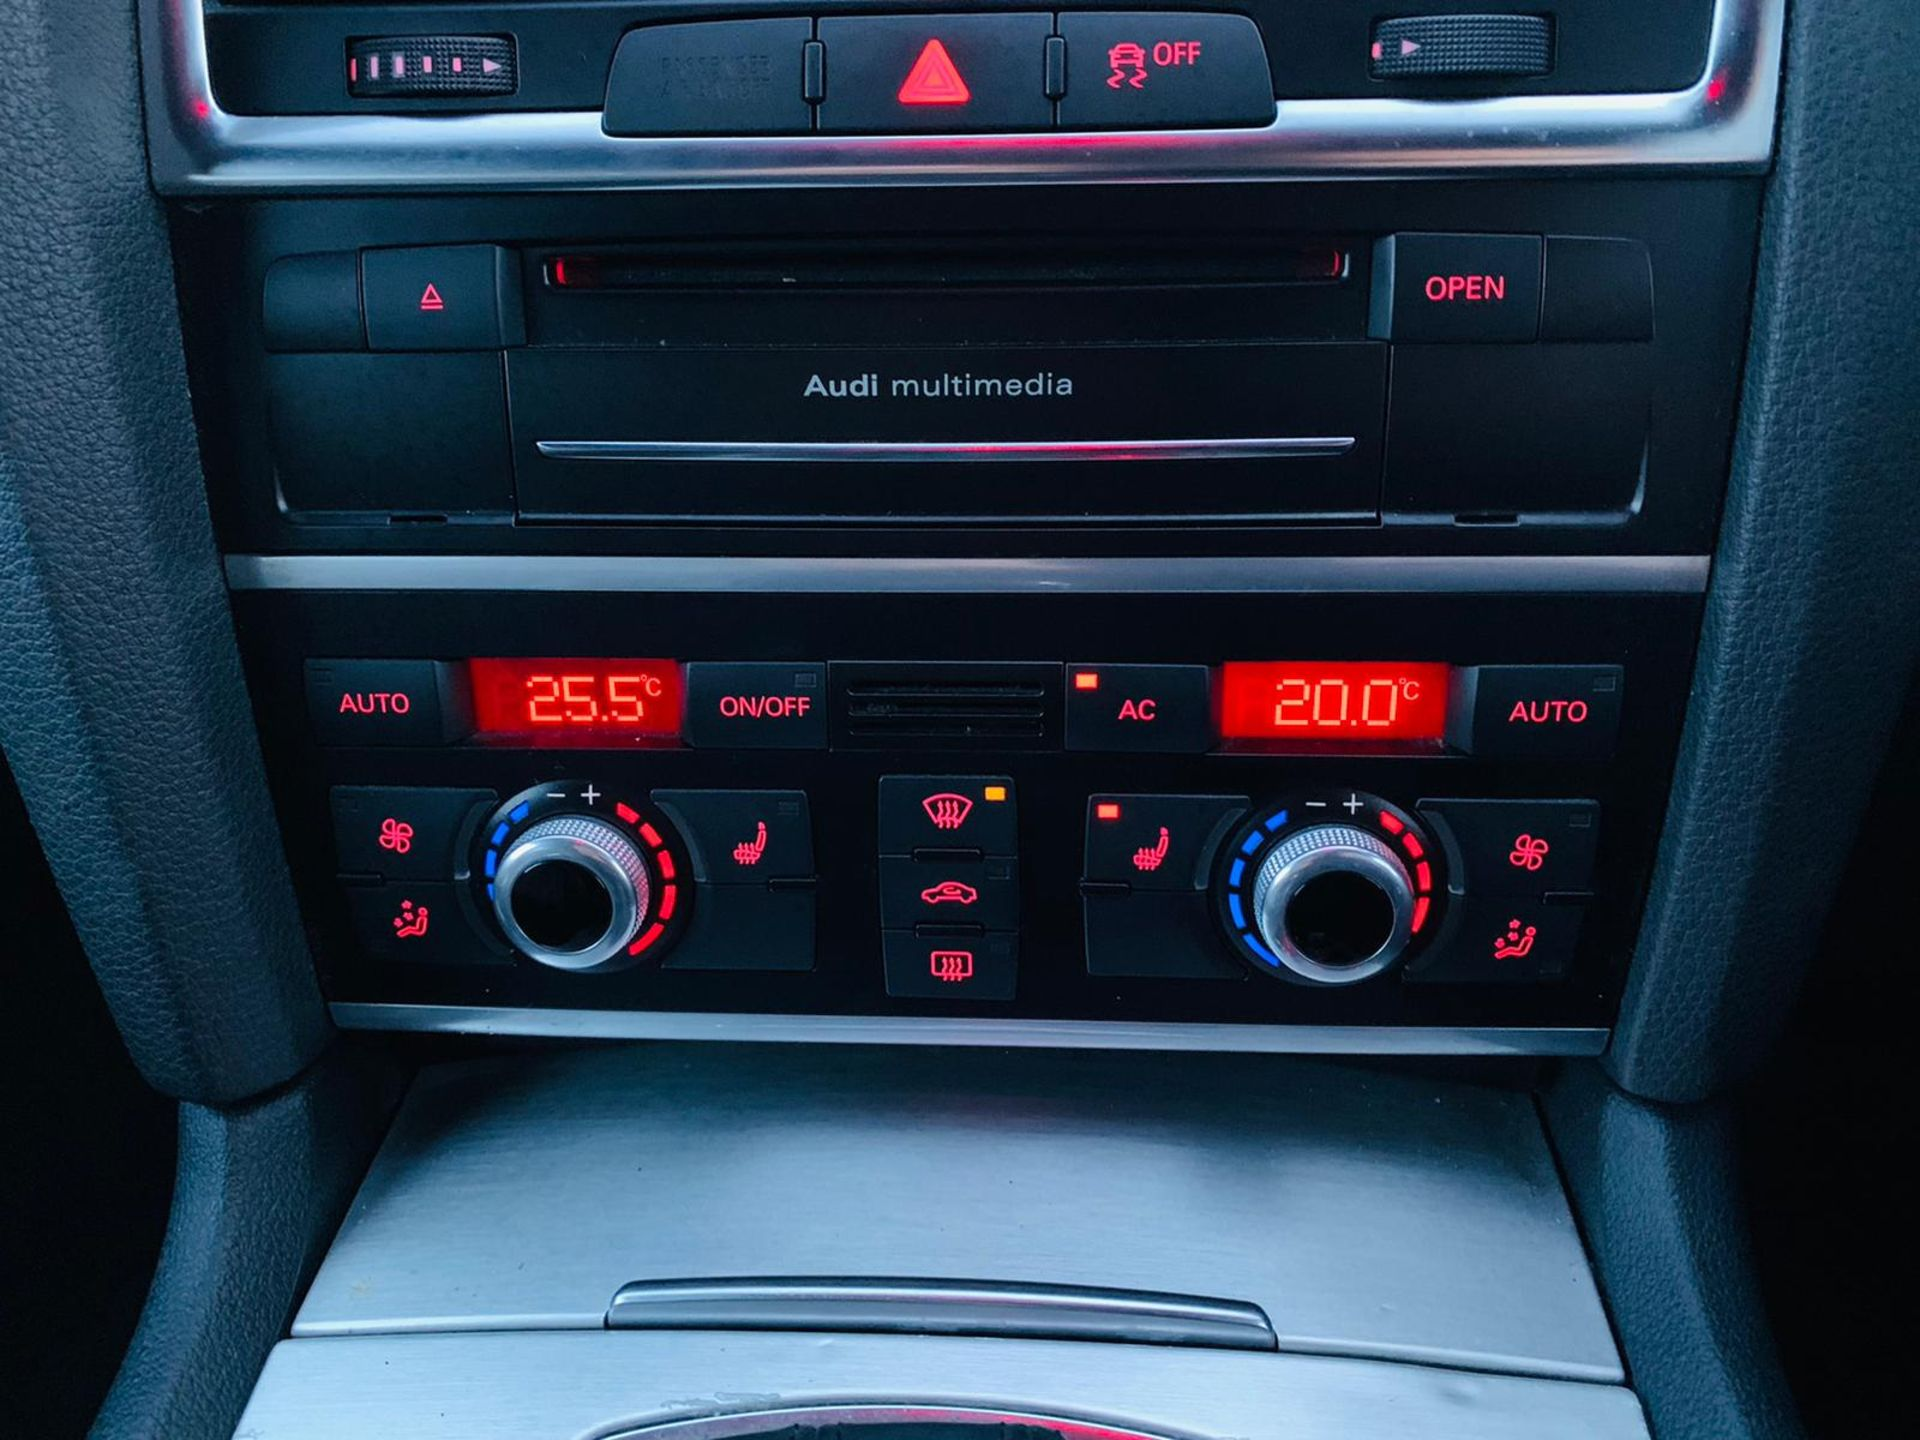 (Reserve Met)Audi Q7 3.0 TDI Quattro S Line Plus Auto (7 Seats) - 12 Reg - Only 63k Miles -Sat Nav- - Image 20 of 37